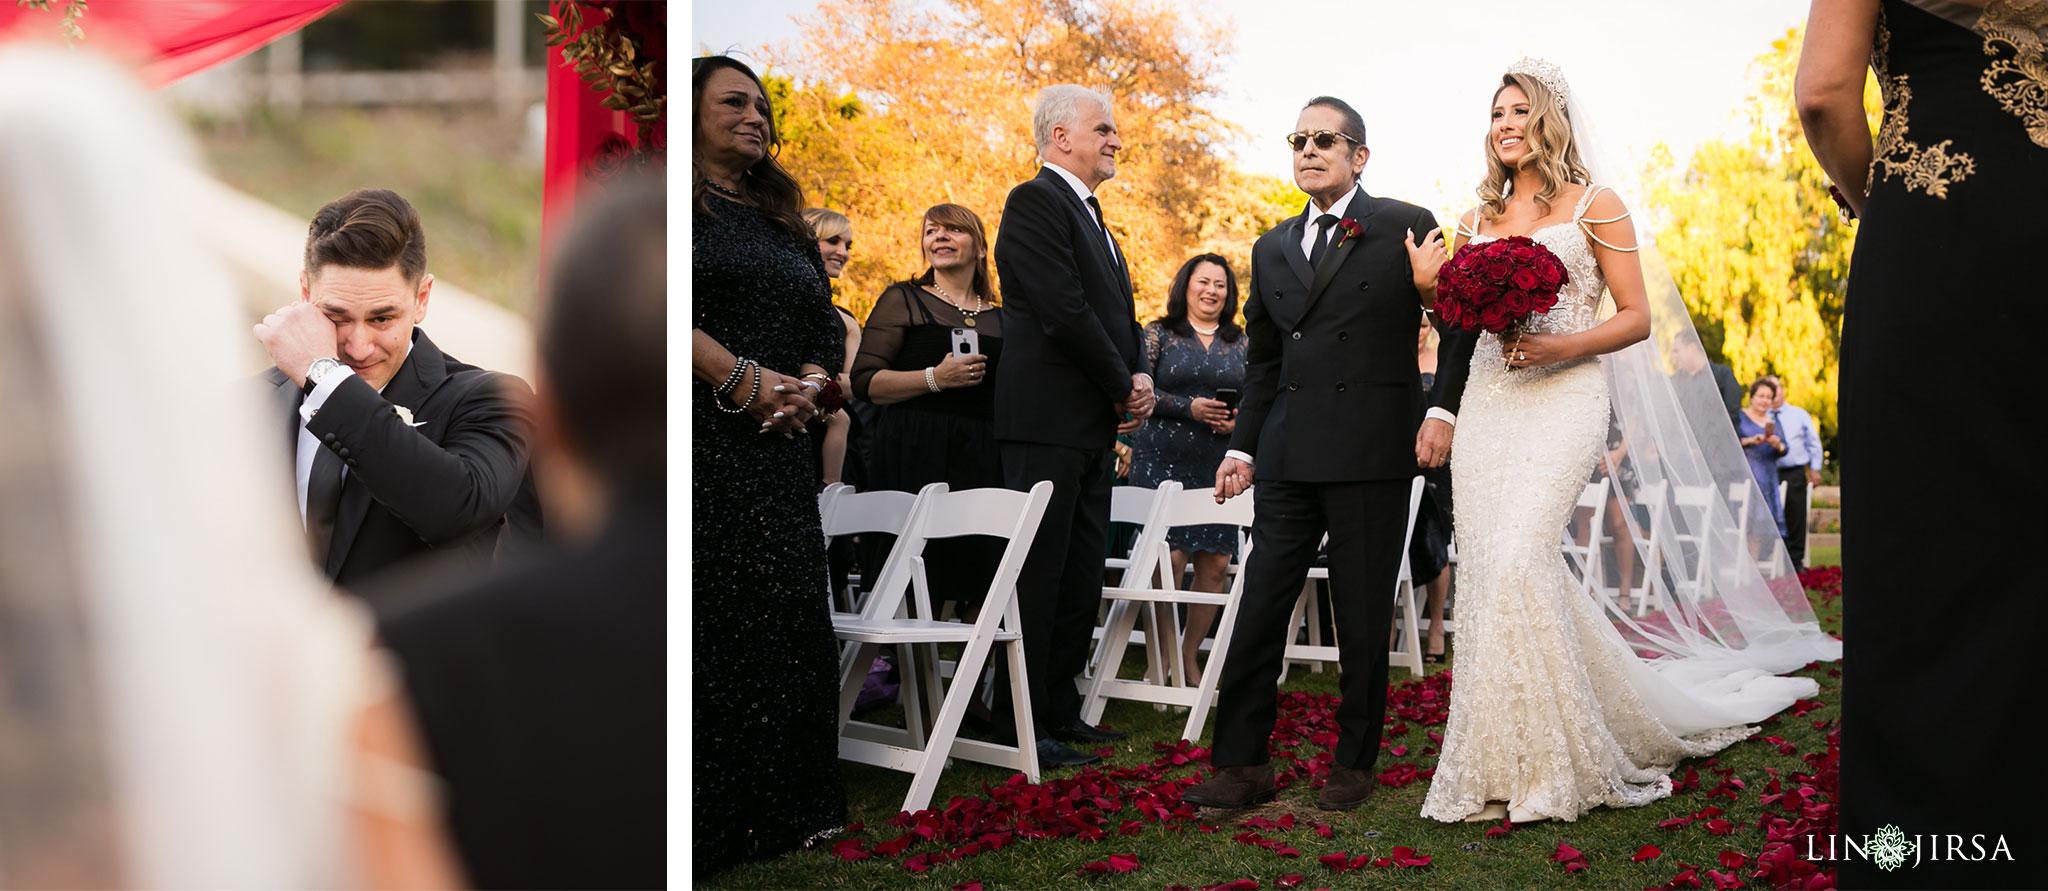 14 richard nixon library wedding ceremony photography